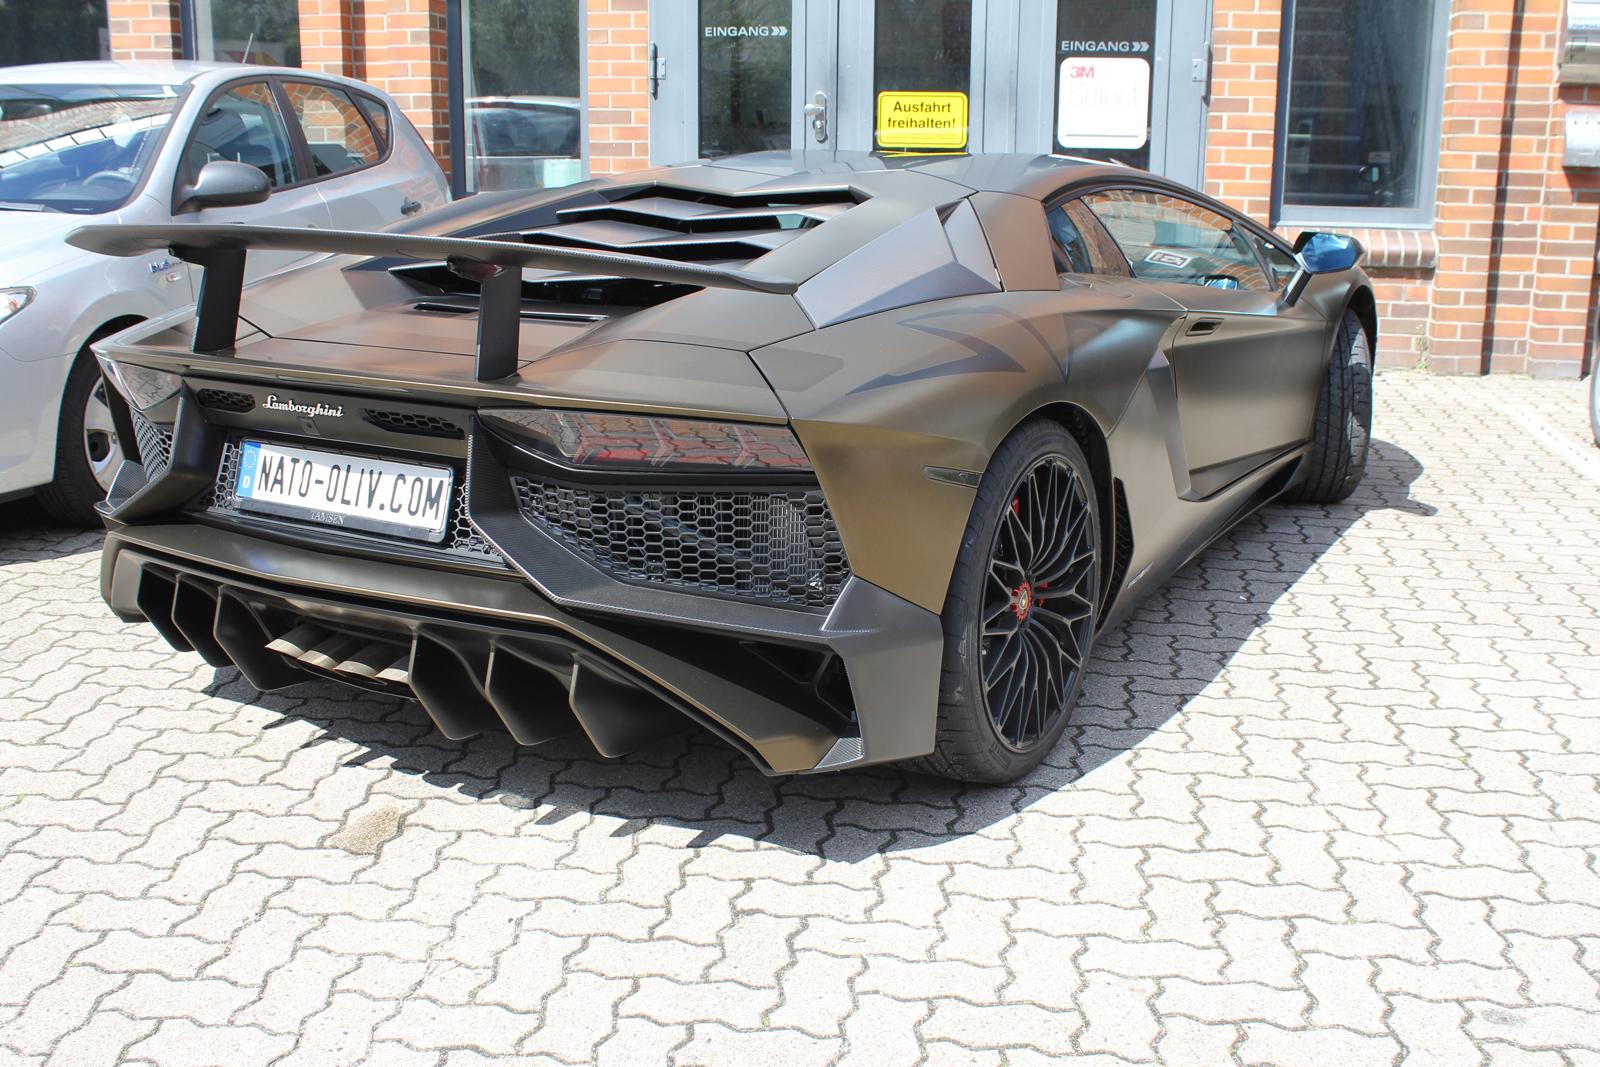 LAMBORGHINI_AVENTADOR_SV_CAR-WRAPPING_BOND_GOLD_04